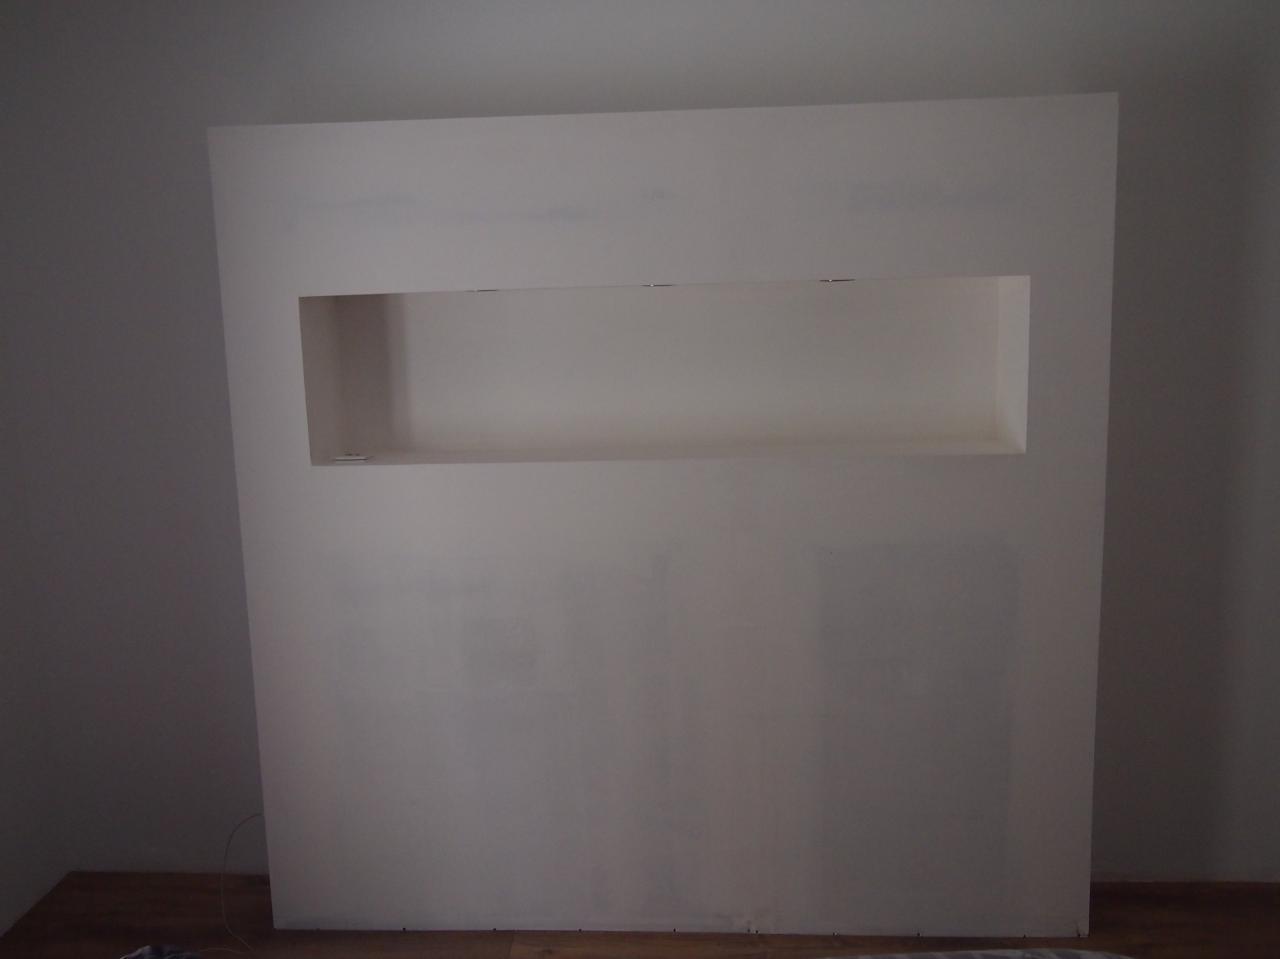 B ton cir murs de cuisine salon et t te de lit - Mur beton cire salon ...